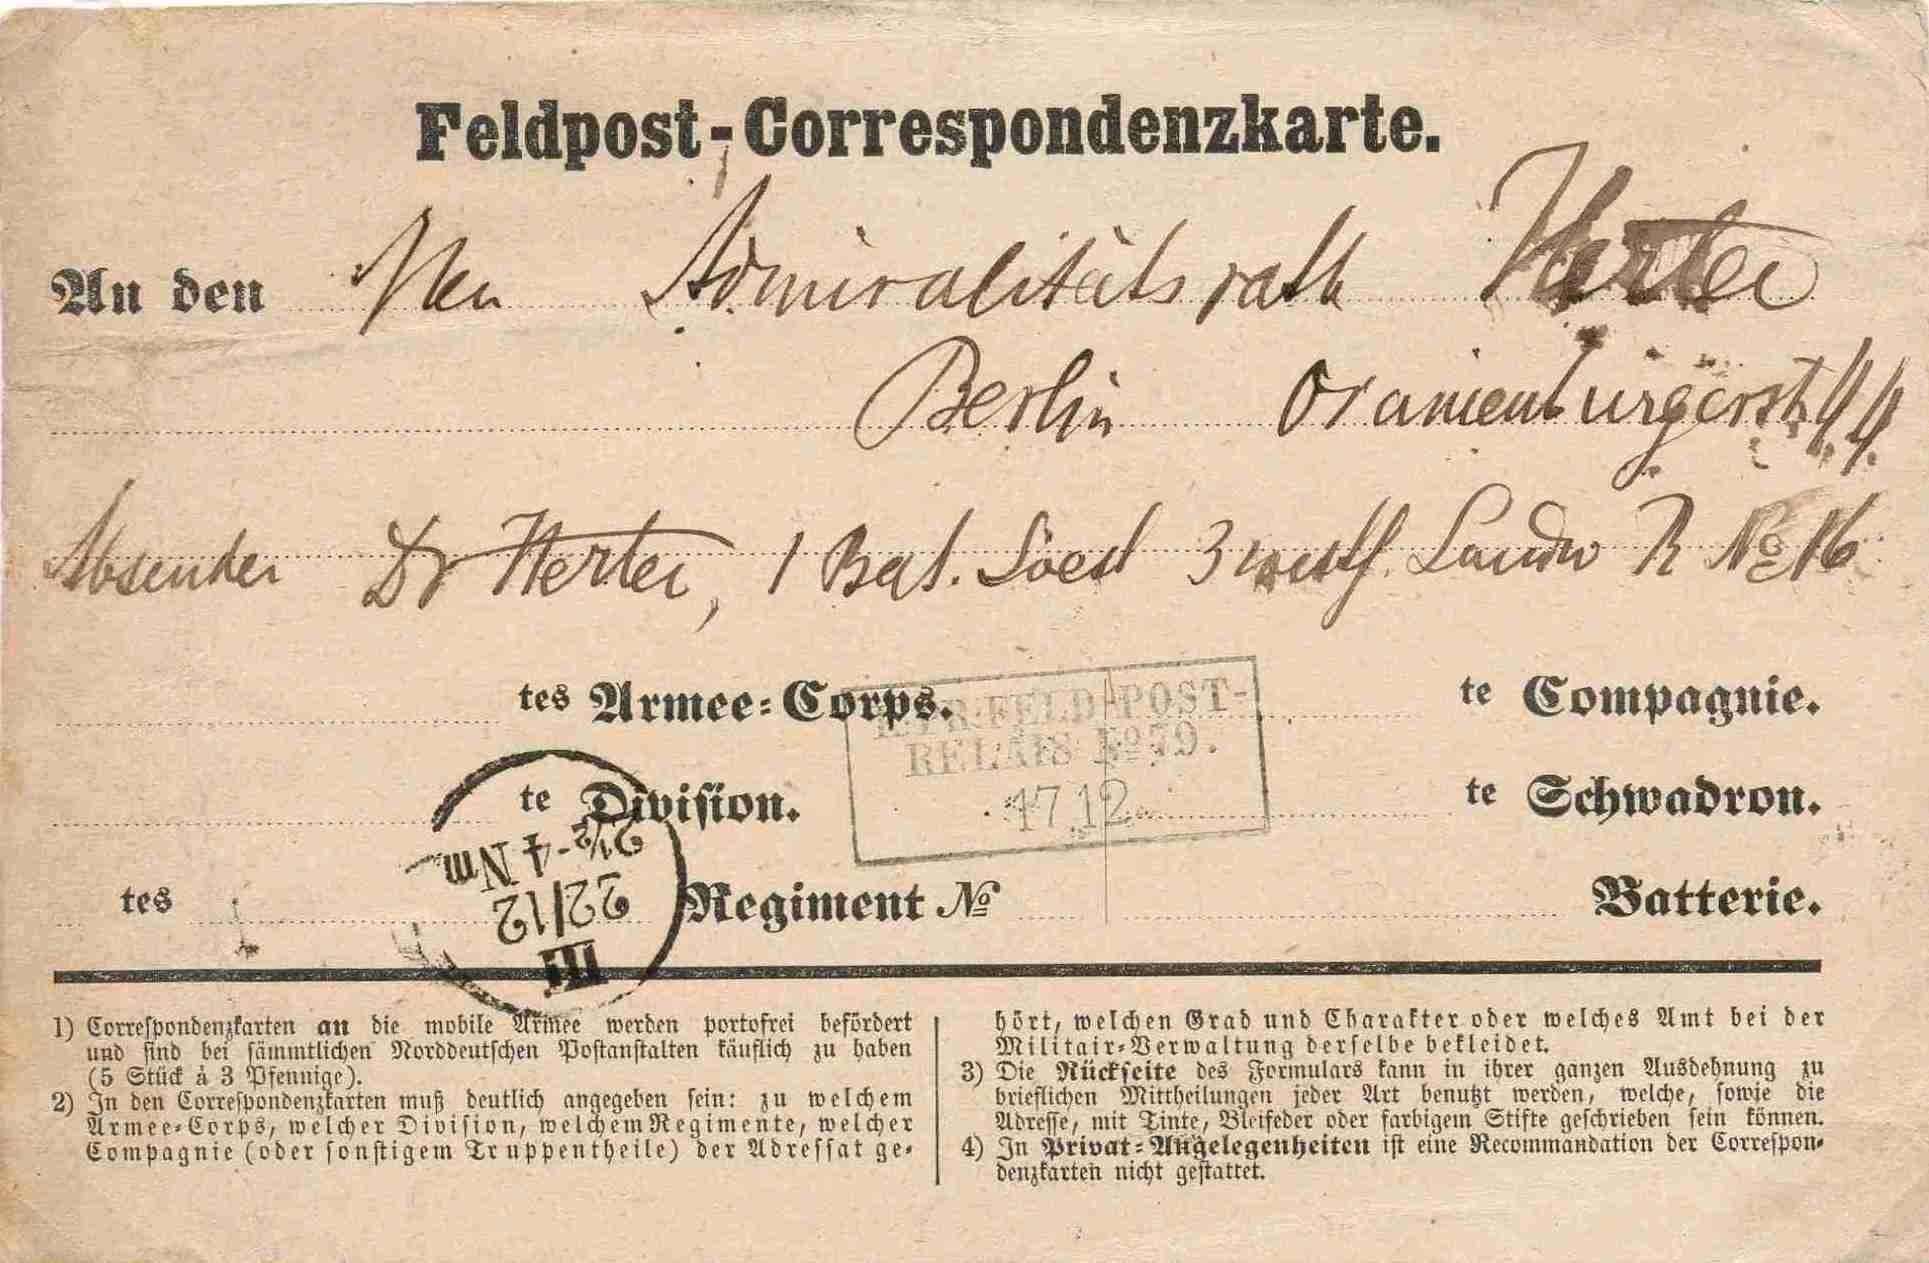 Guerre de 1870 – la carte de correspondance militaire prussienne : 'Feldpost-Correspondenzkarte'